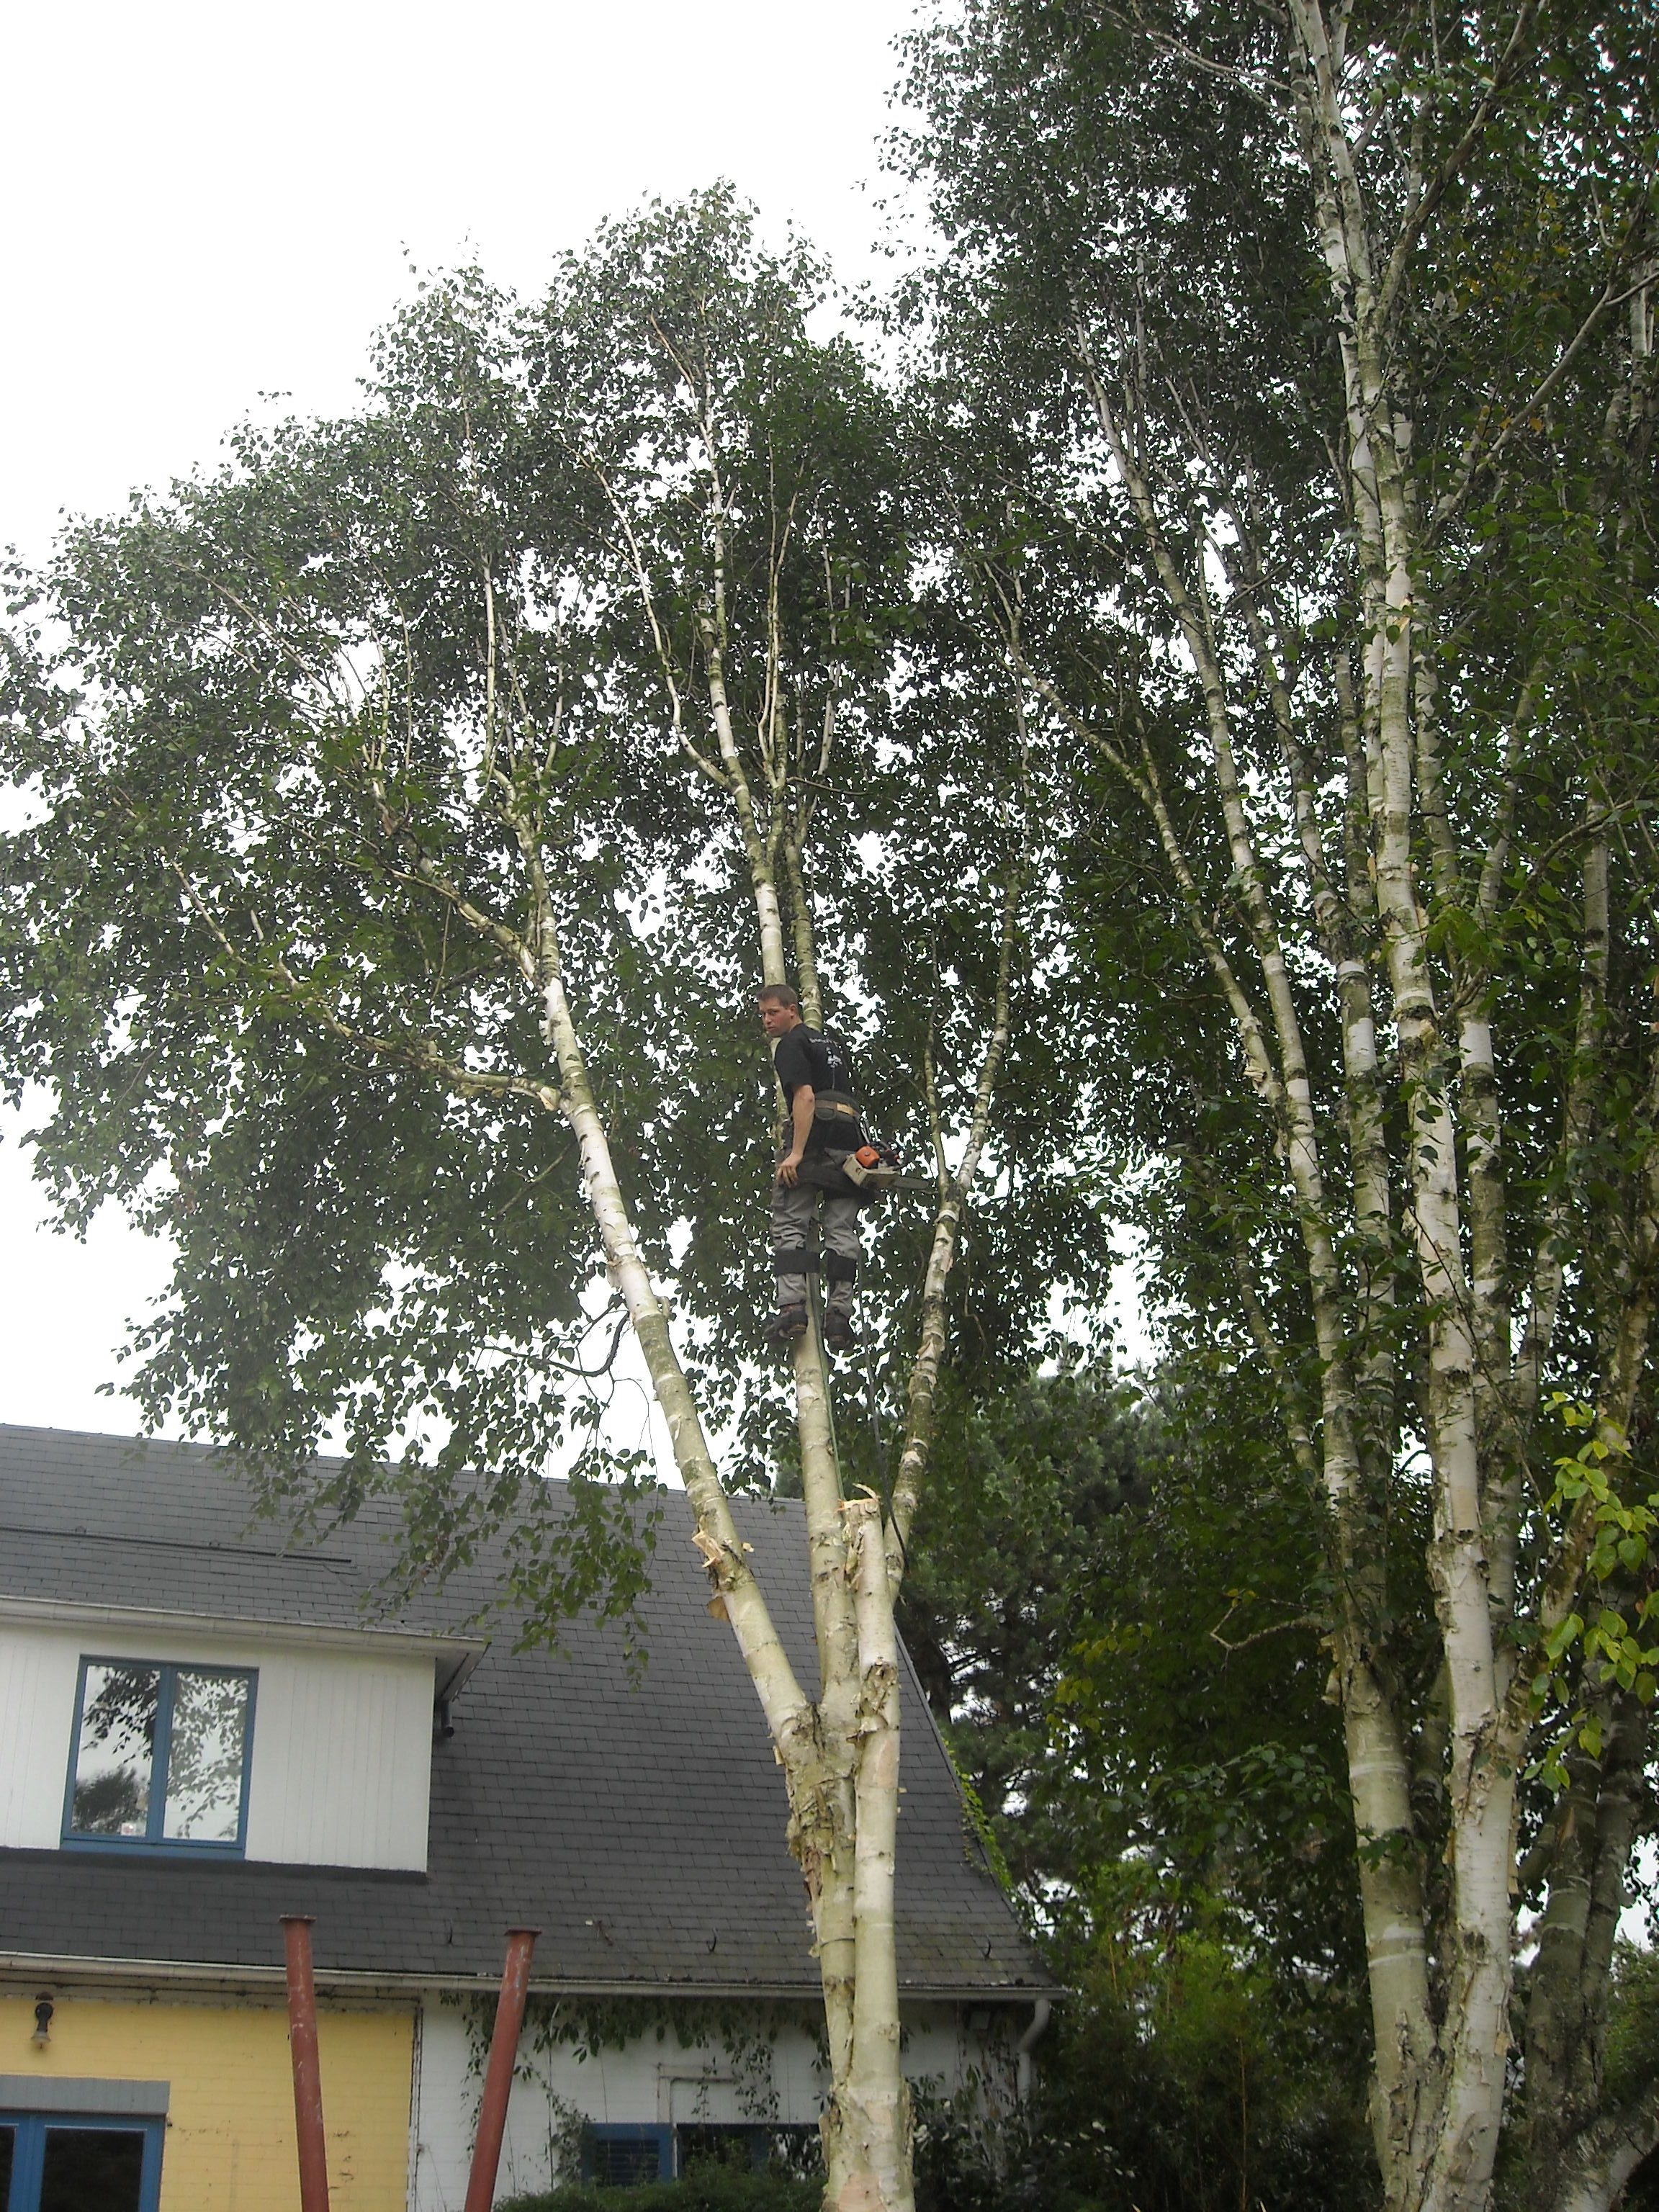 cyprien meskens abattage lagage d 39 arbres pose de cl tures cr ation pelouse pavage. Black Bedroom Furniture Sets. Home Design Ideas